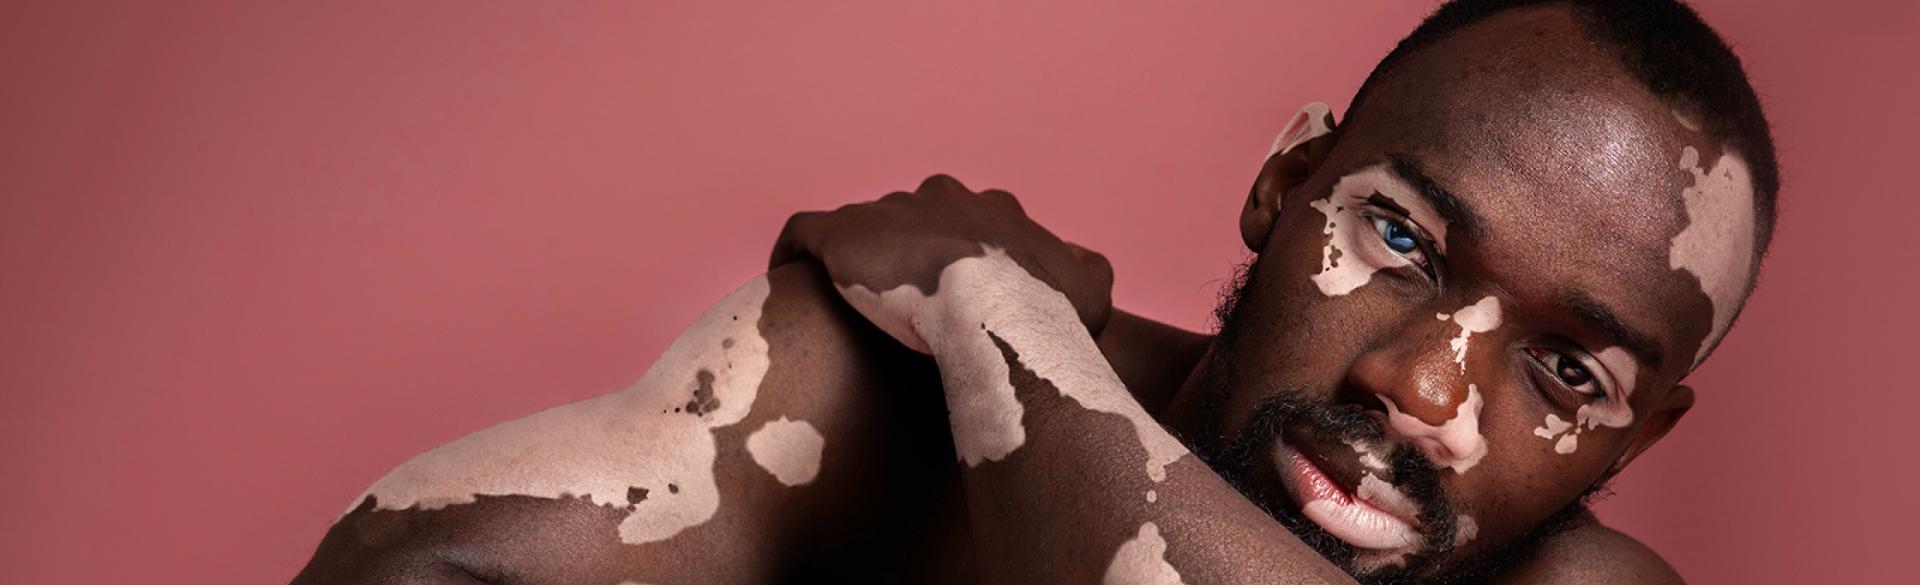 causes-of-vitiligo-1